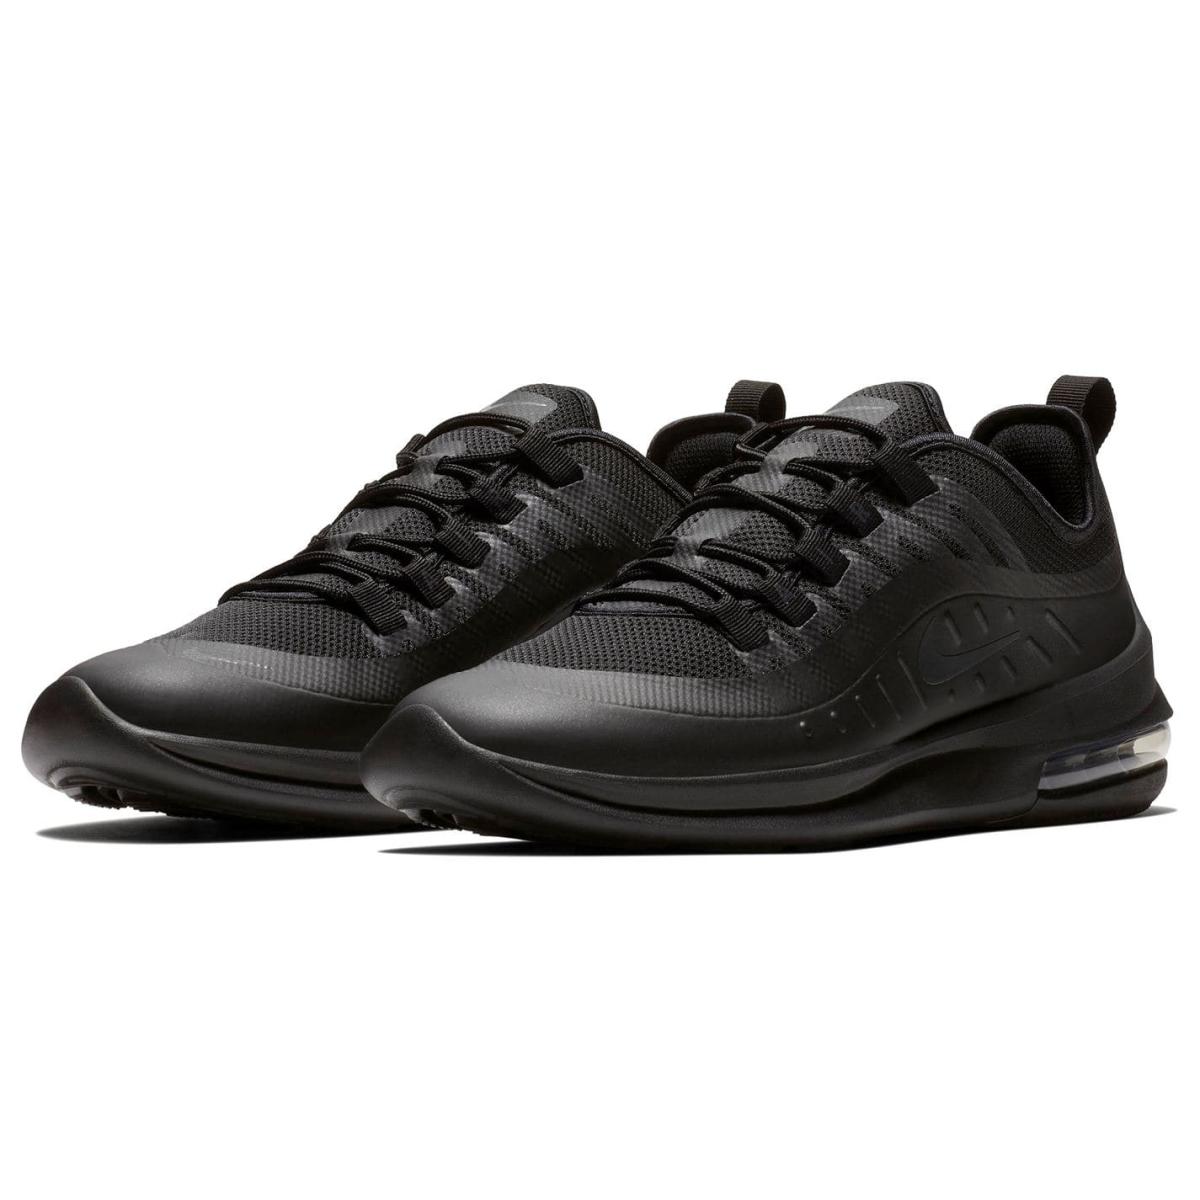 NIKE-Air-Max-Axis-Scarpe-da-ginnastica-Scarpe-da-Corsa-Uomo-Sneaker-Scarpe-Sportive-Fitness-1313 miniatura 5